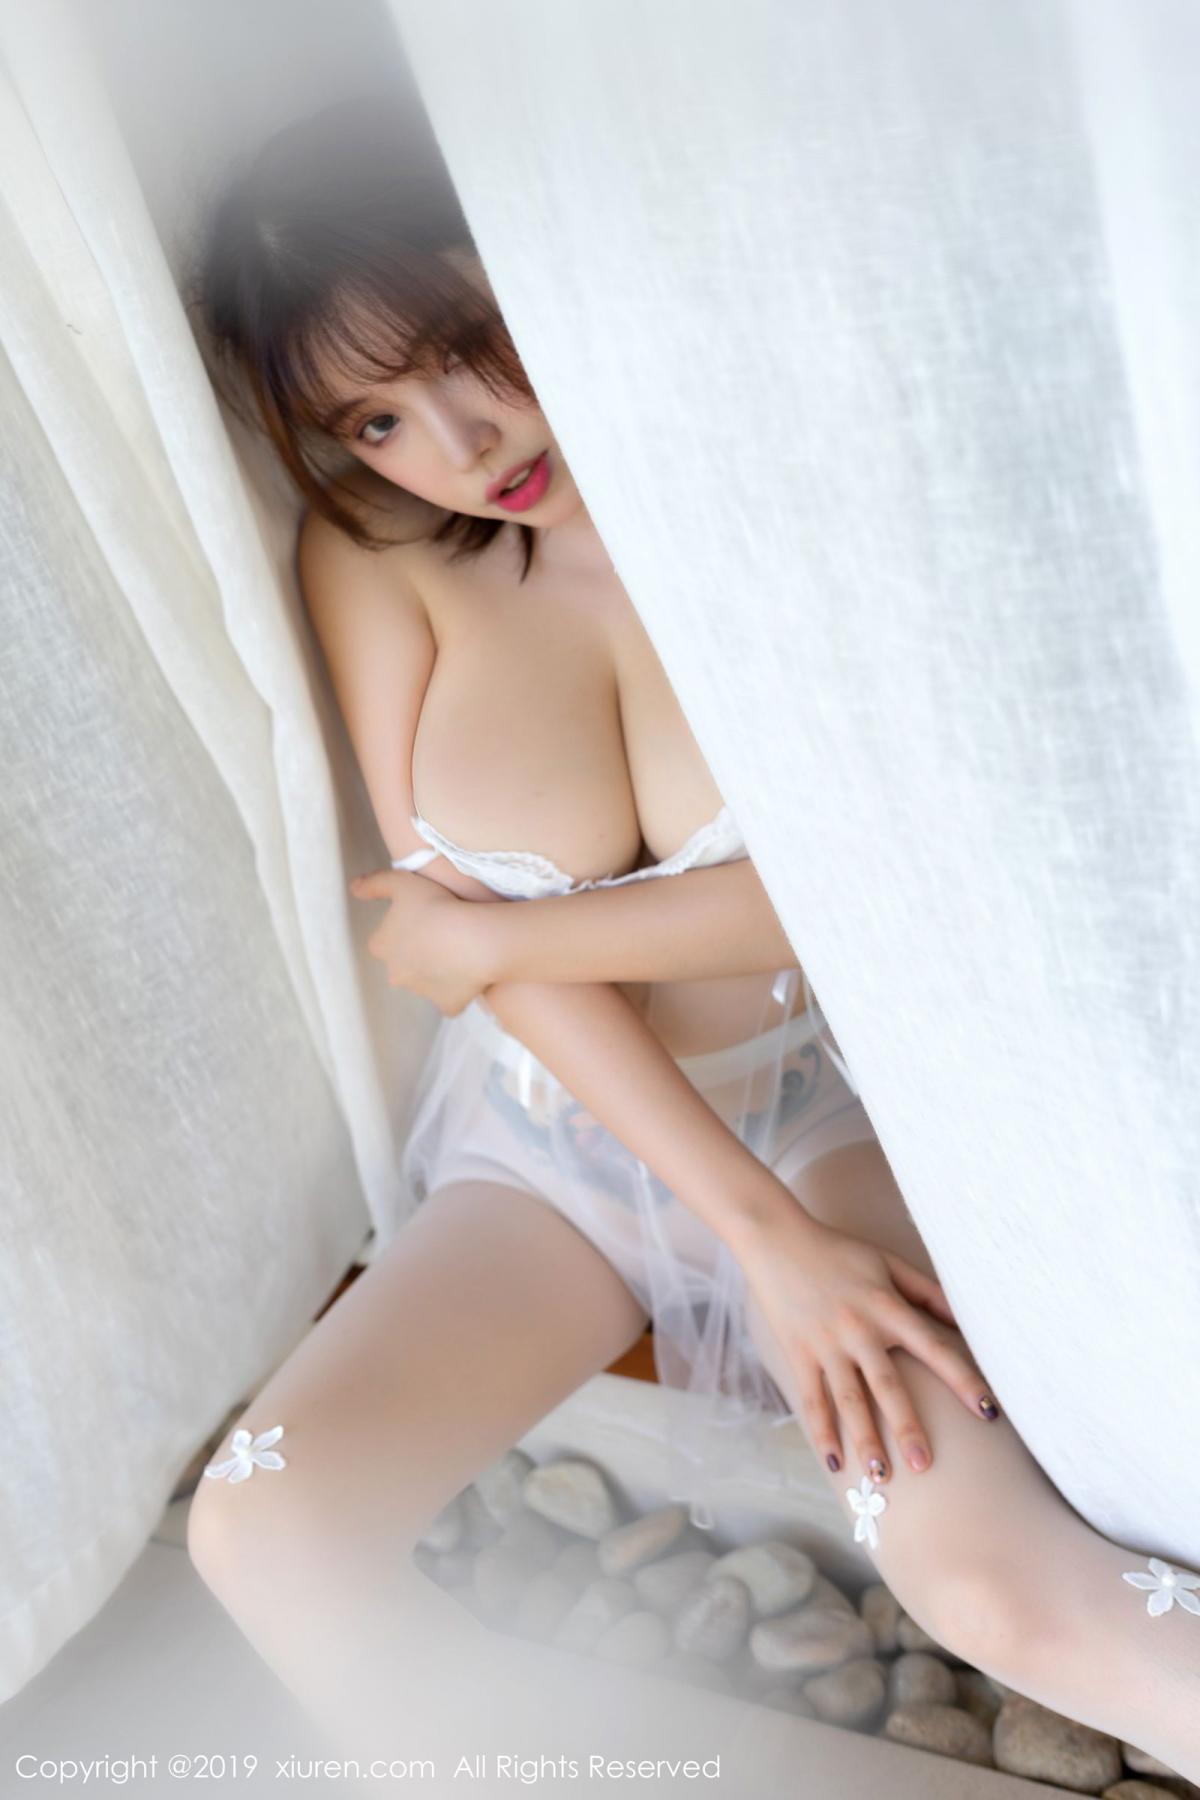 [XiuRen] Vol.1578 Huang Le Ran 18P, Huang Le Ran, Underwear, Xiuren